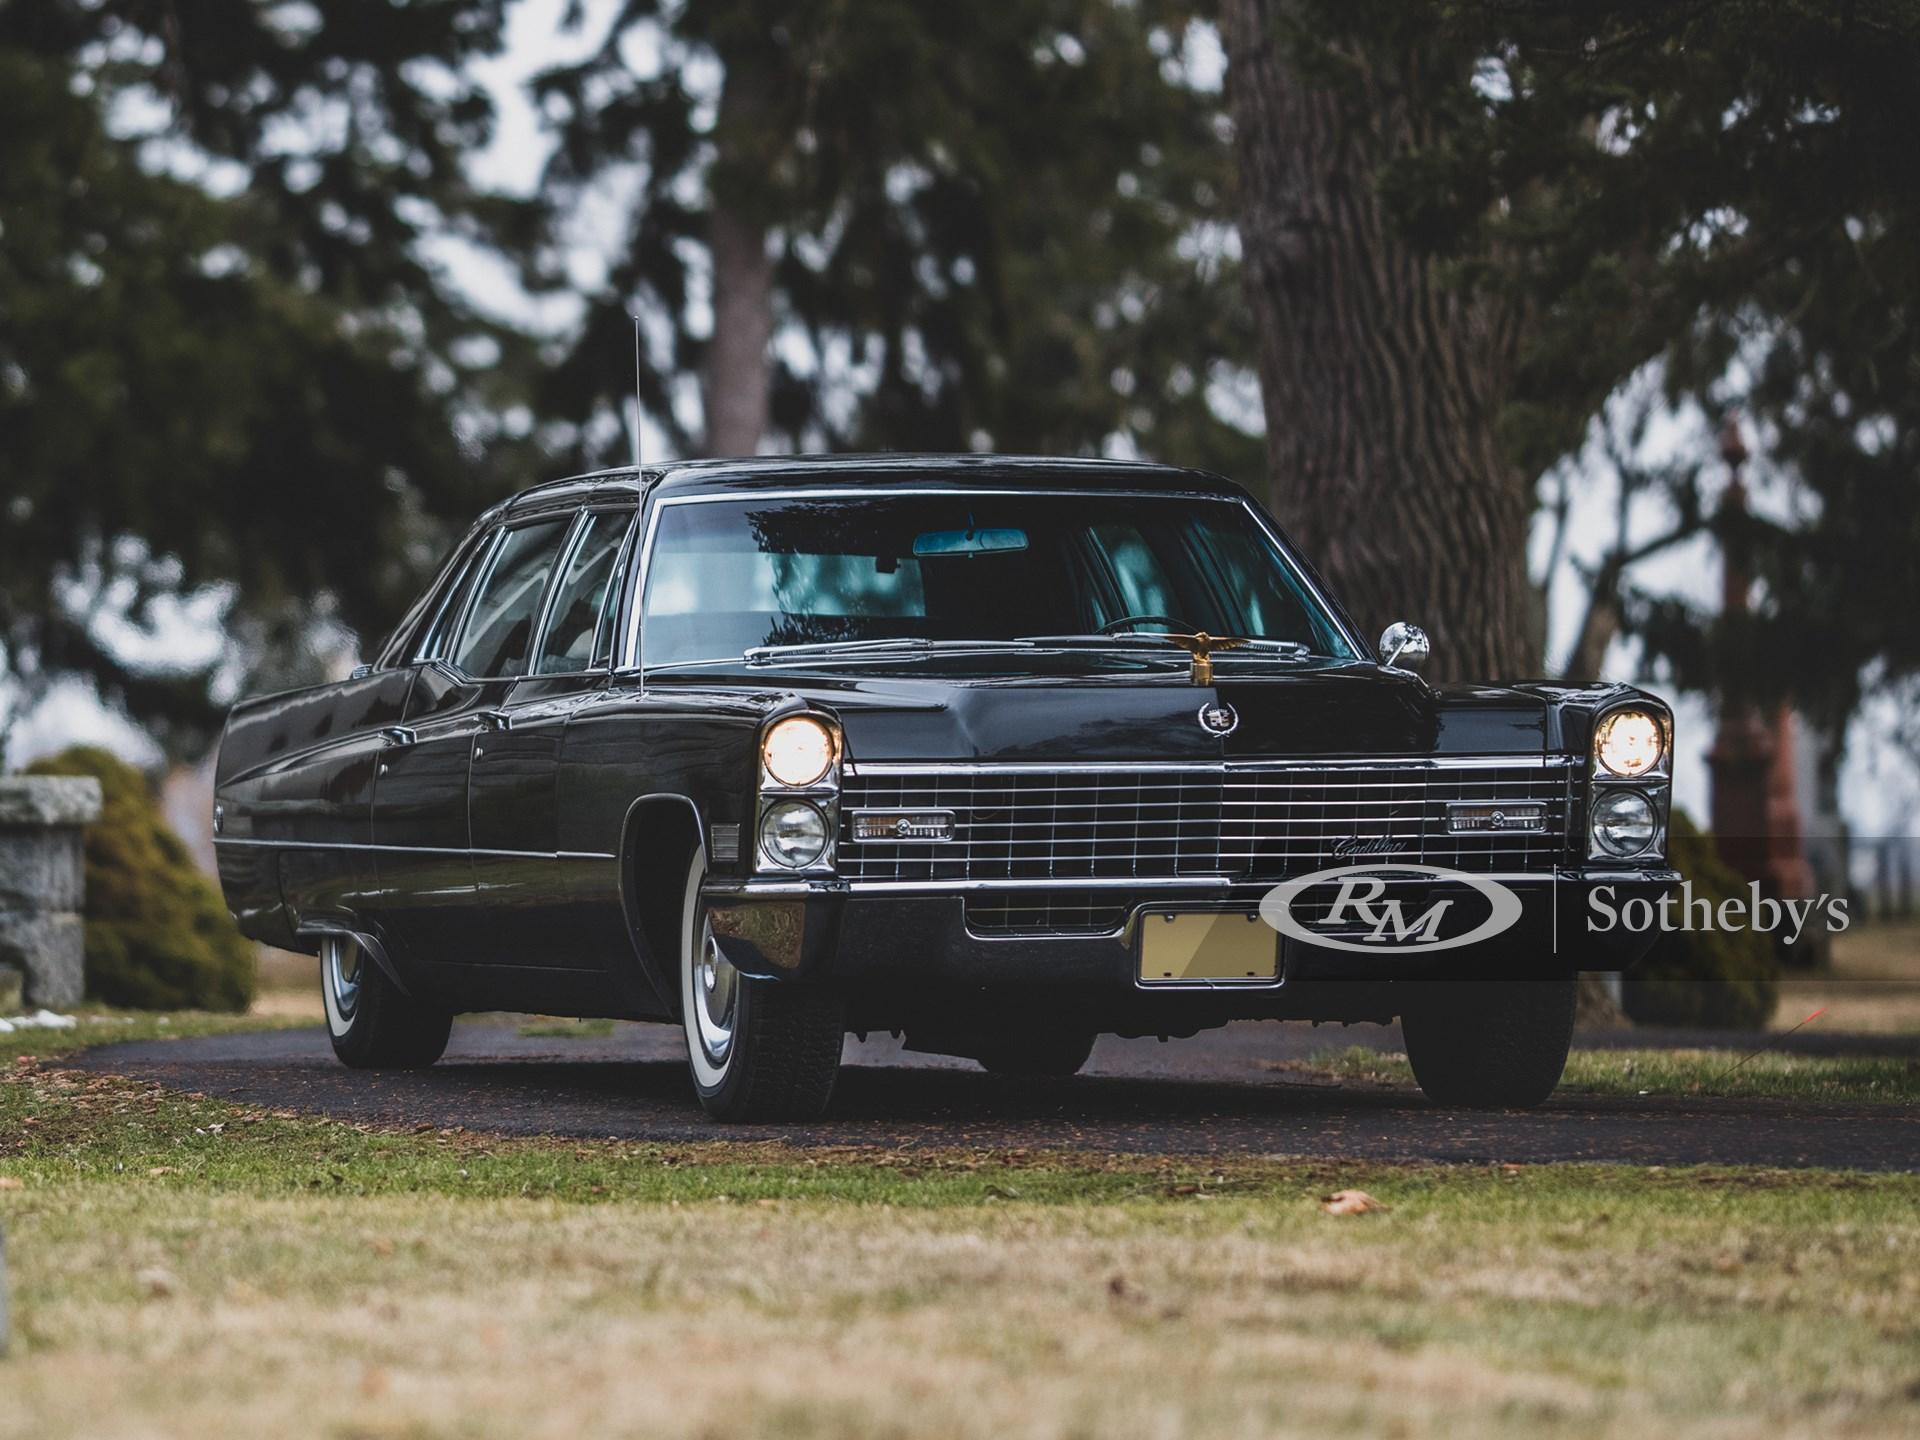 1967 Cadillac Series 75 Fleetwood Limousine  -